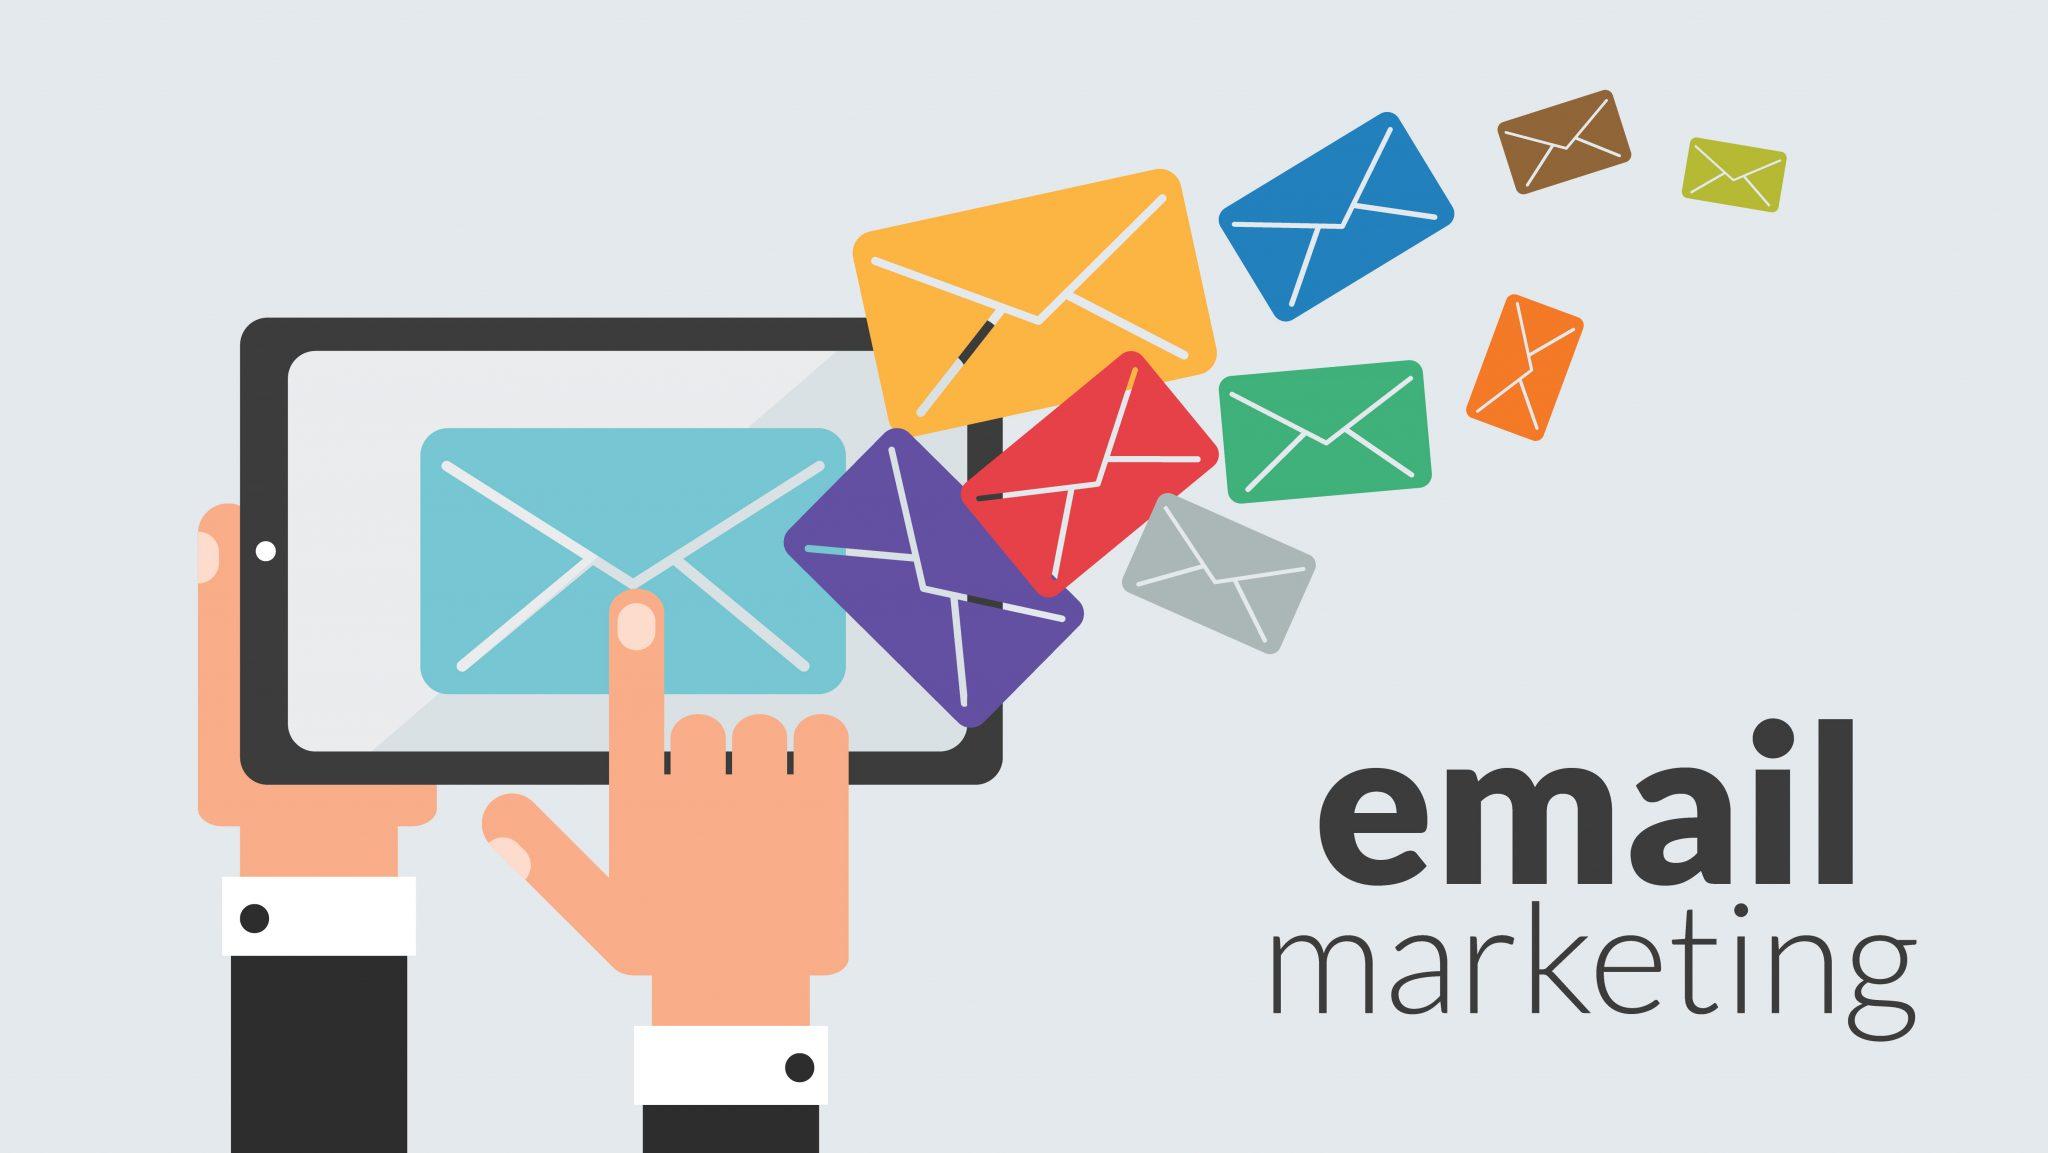 SỨC MẠNH của Email Marketing - Marketing Online - Zetamail Blog email  marketing